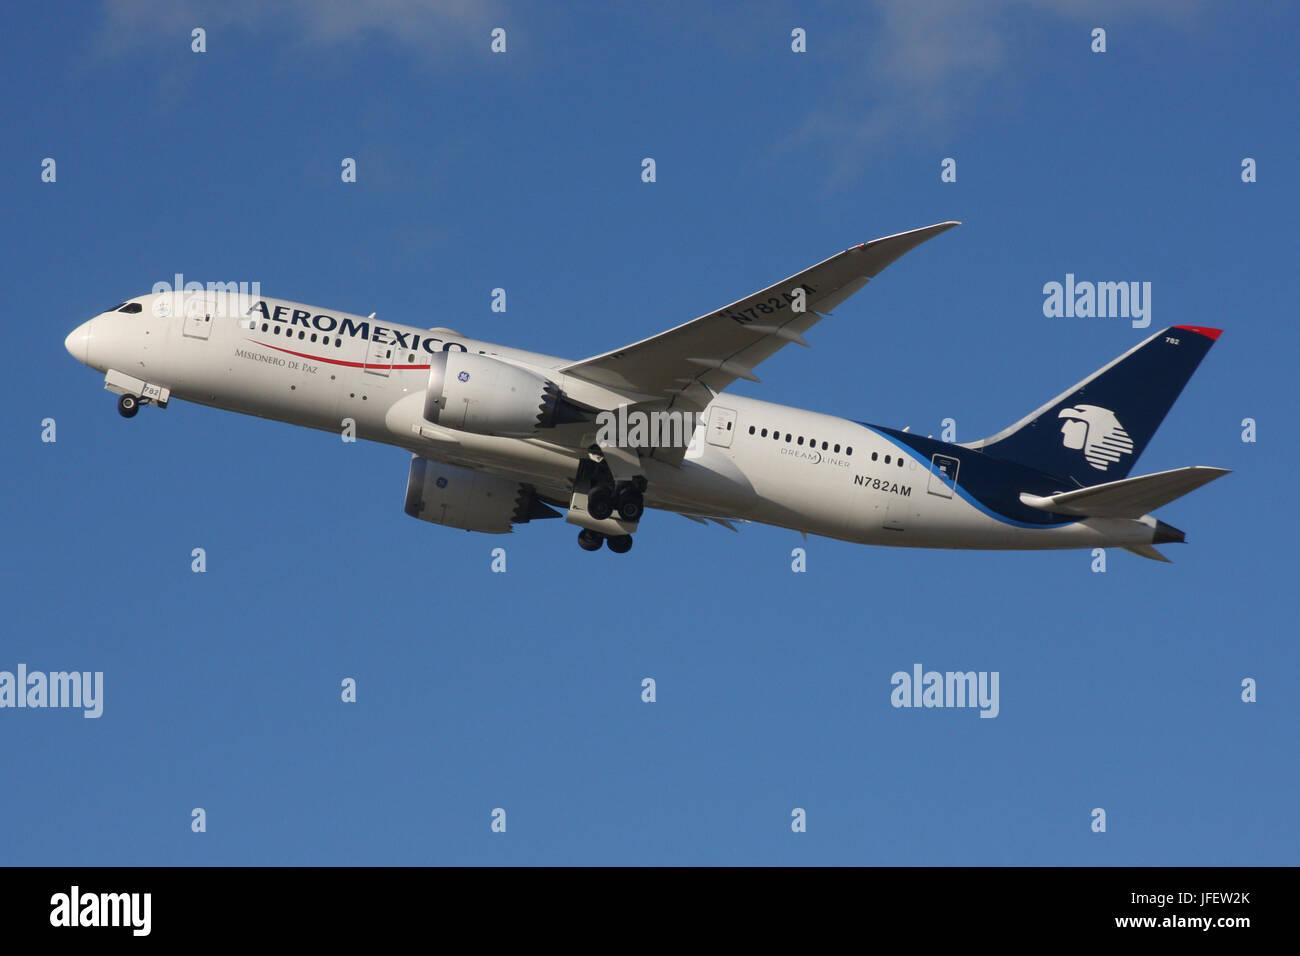 AEROMEXICO 787 - Stock Image